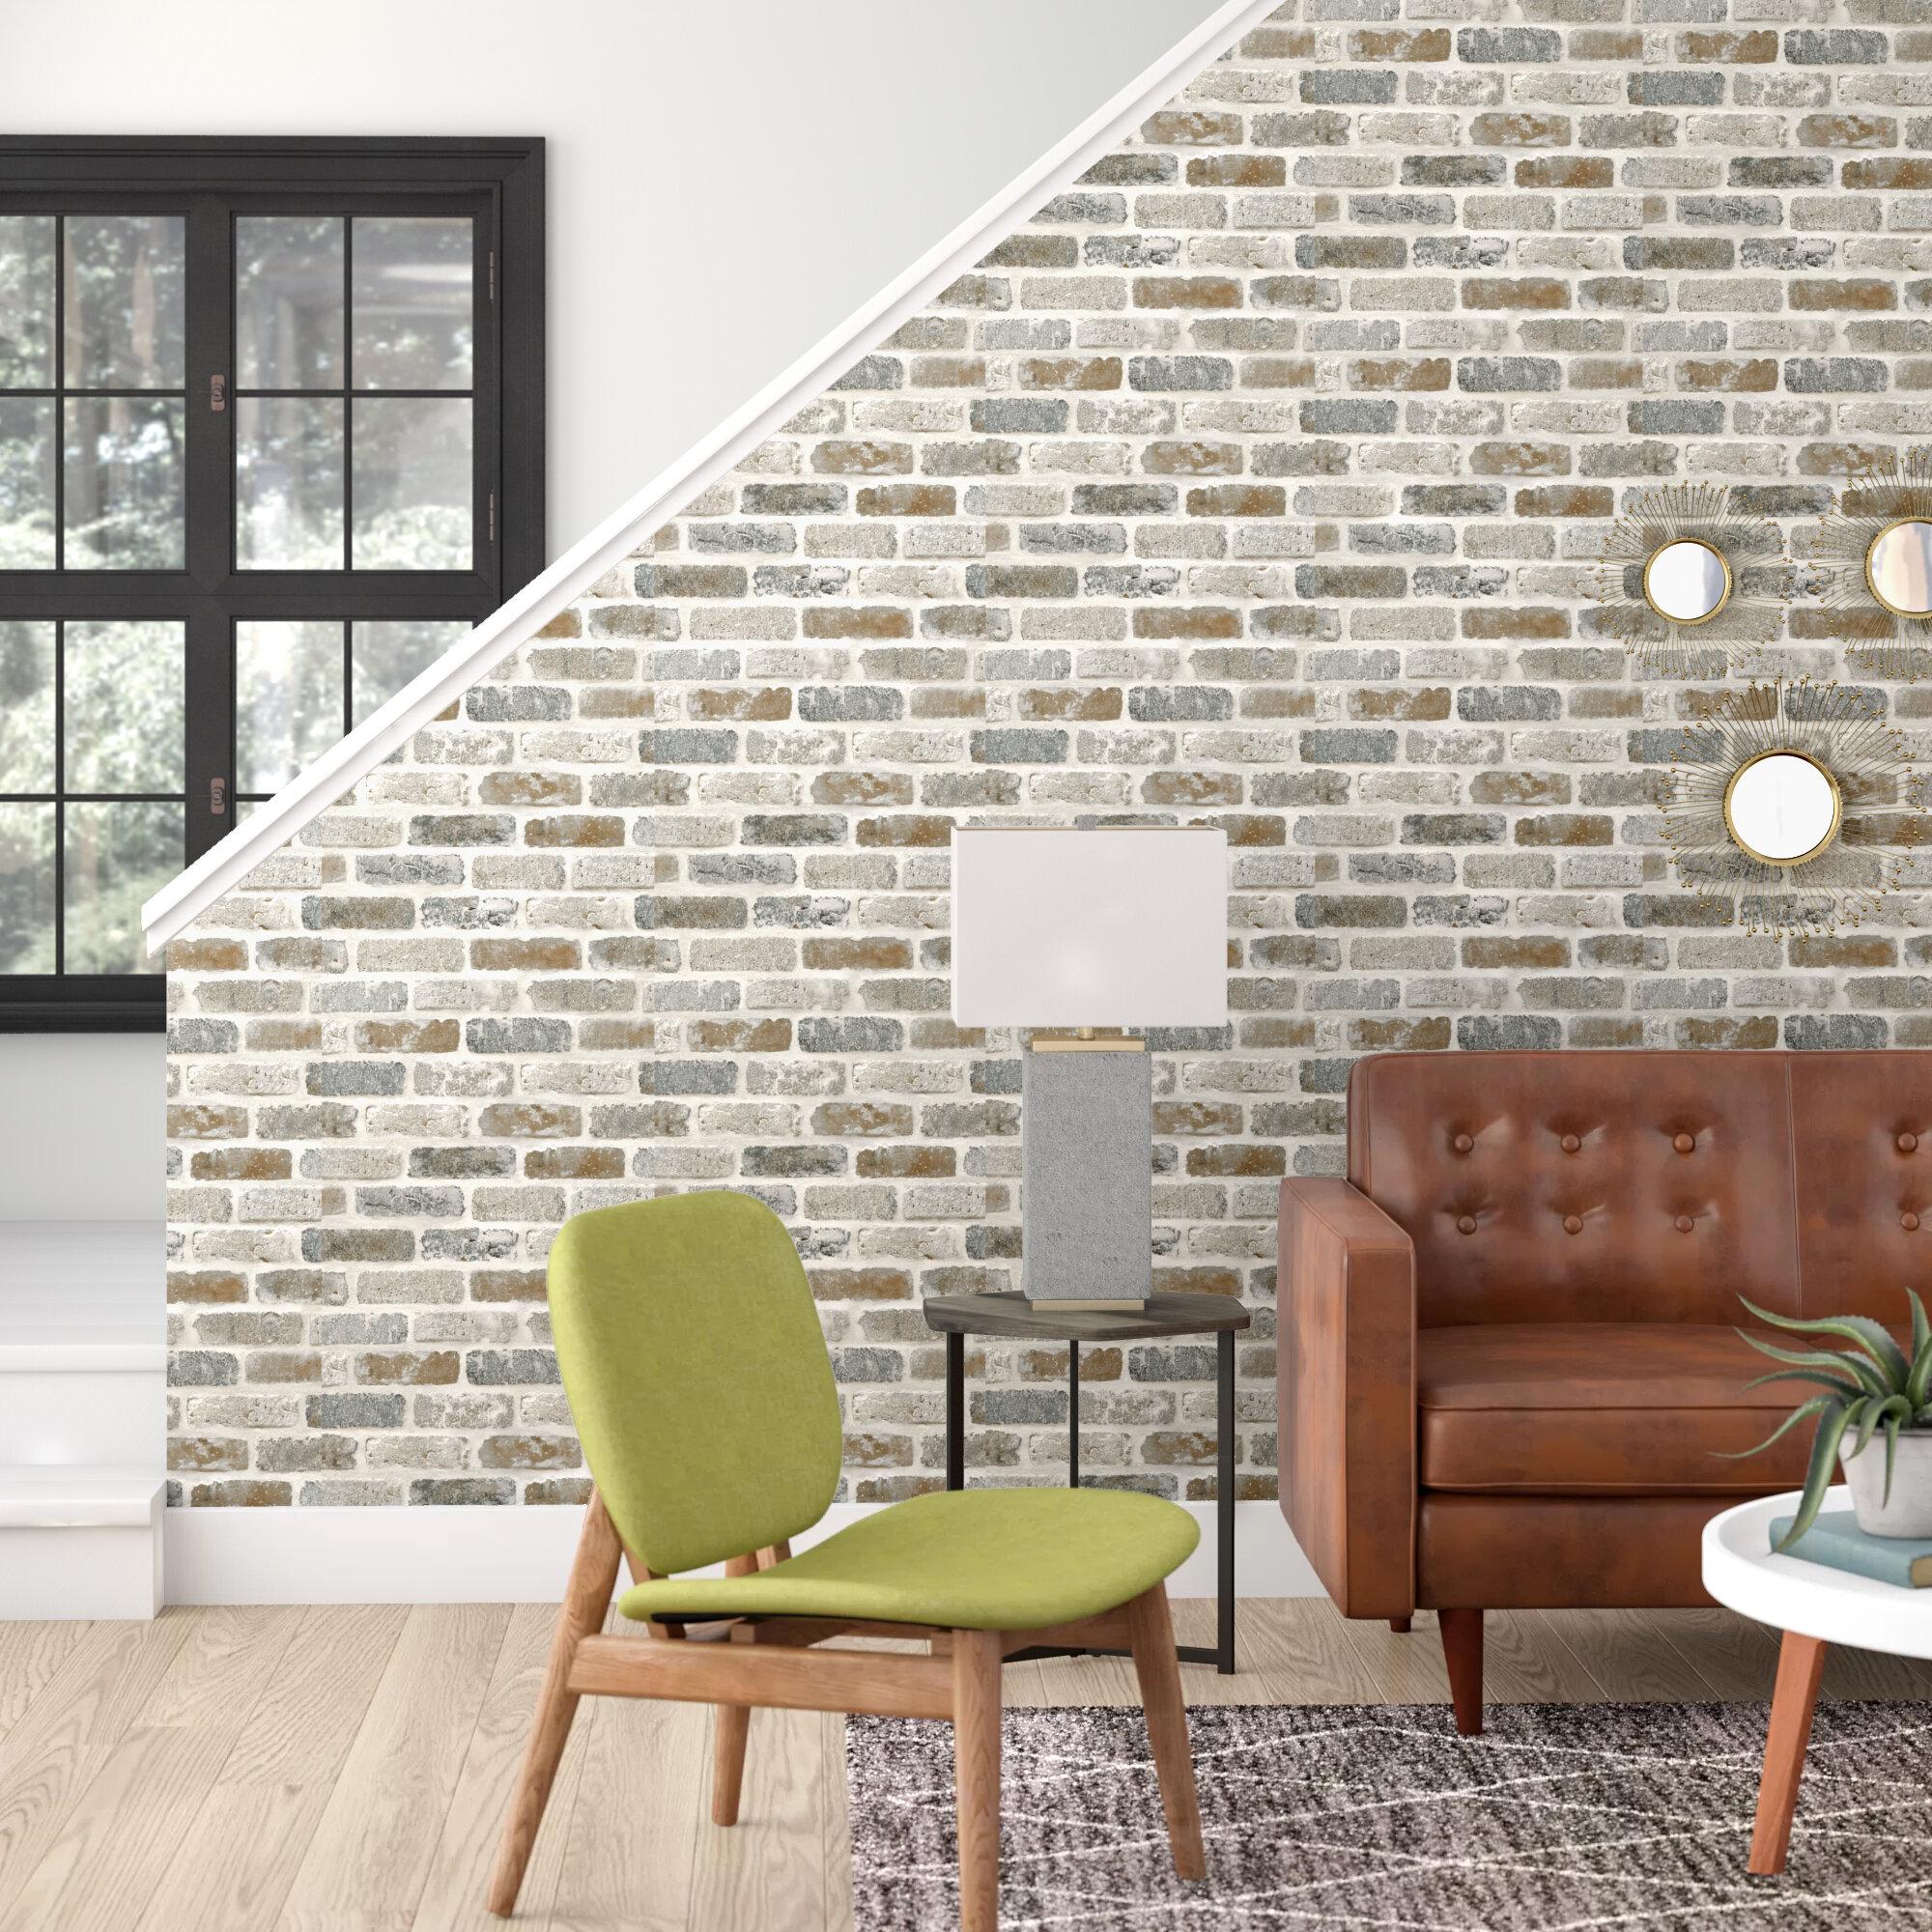 Ebern Designs Perla Washed 18 L X 20 5 W Peel And Stick Wallpaper Roll Reviews Wayfair